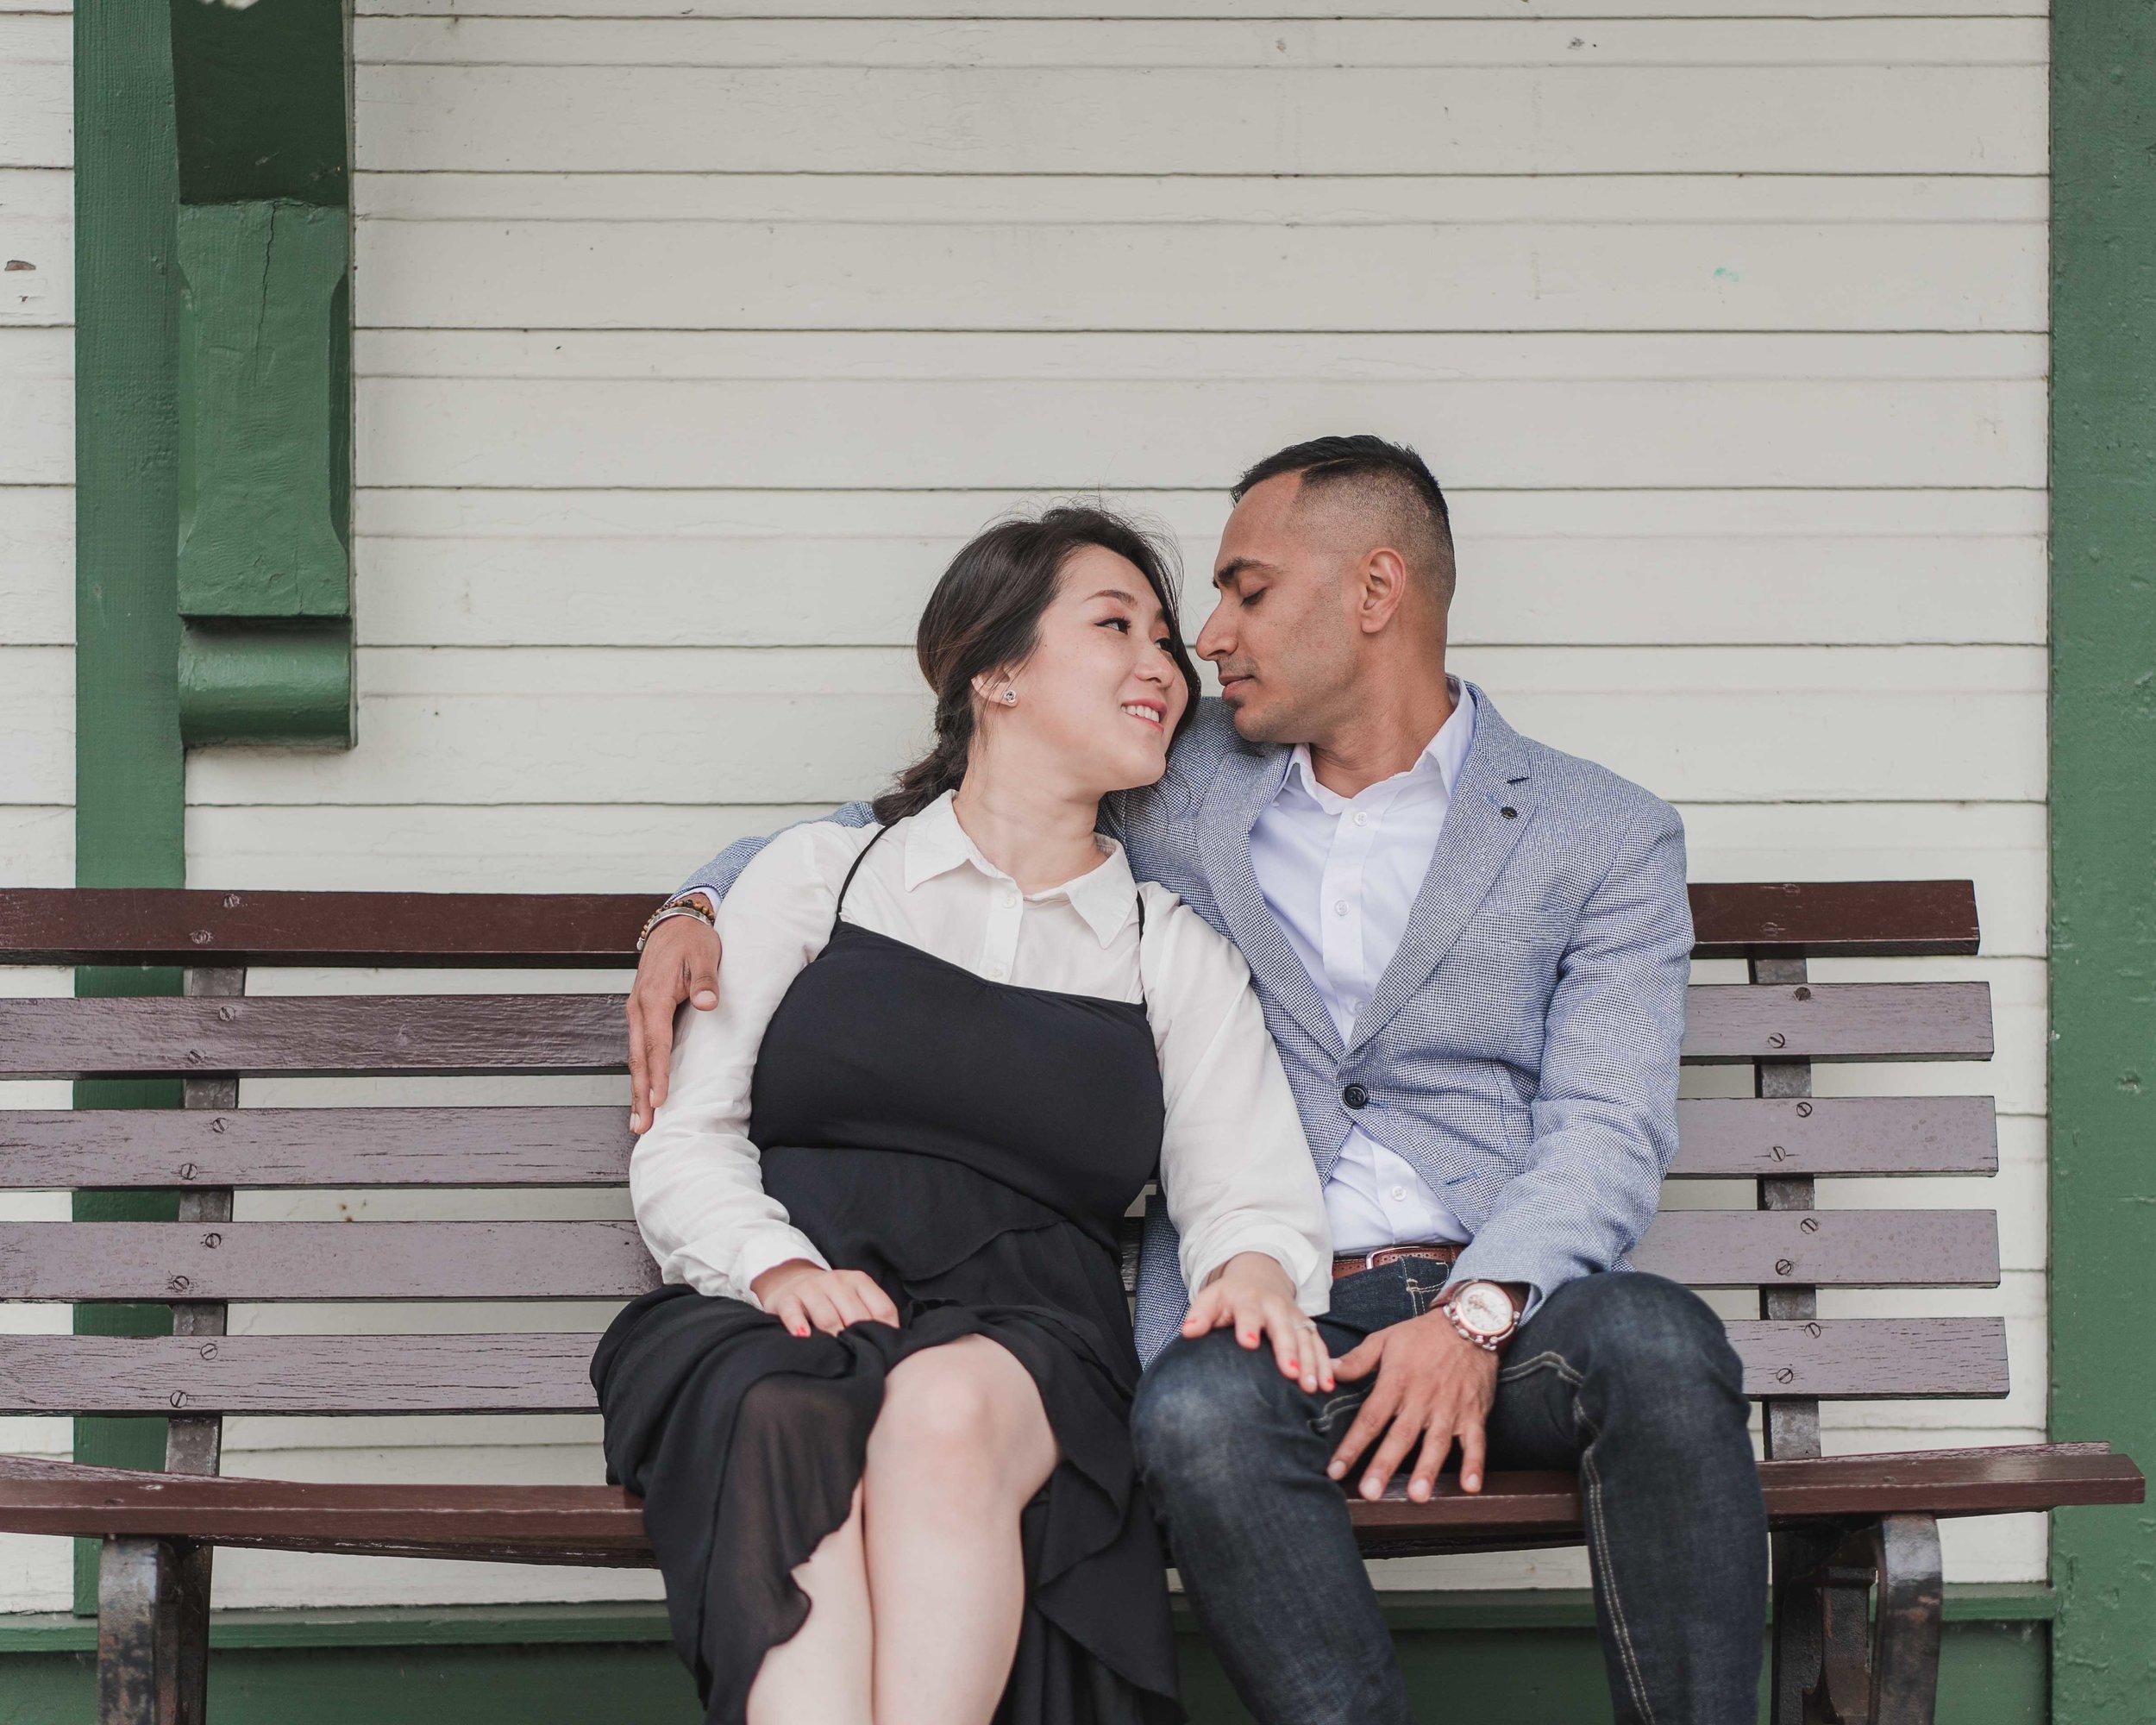 20190622 - Monika & Johnson Engagement - 0200.jpg